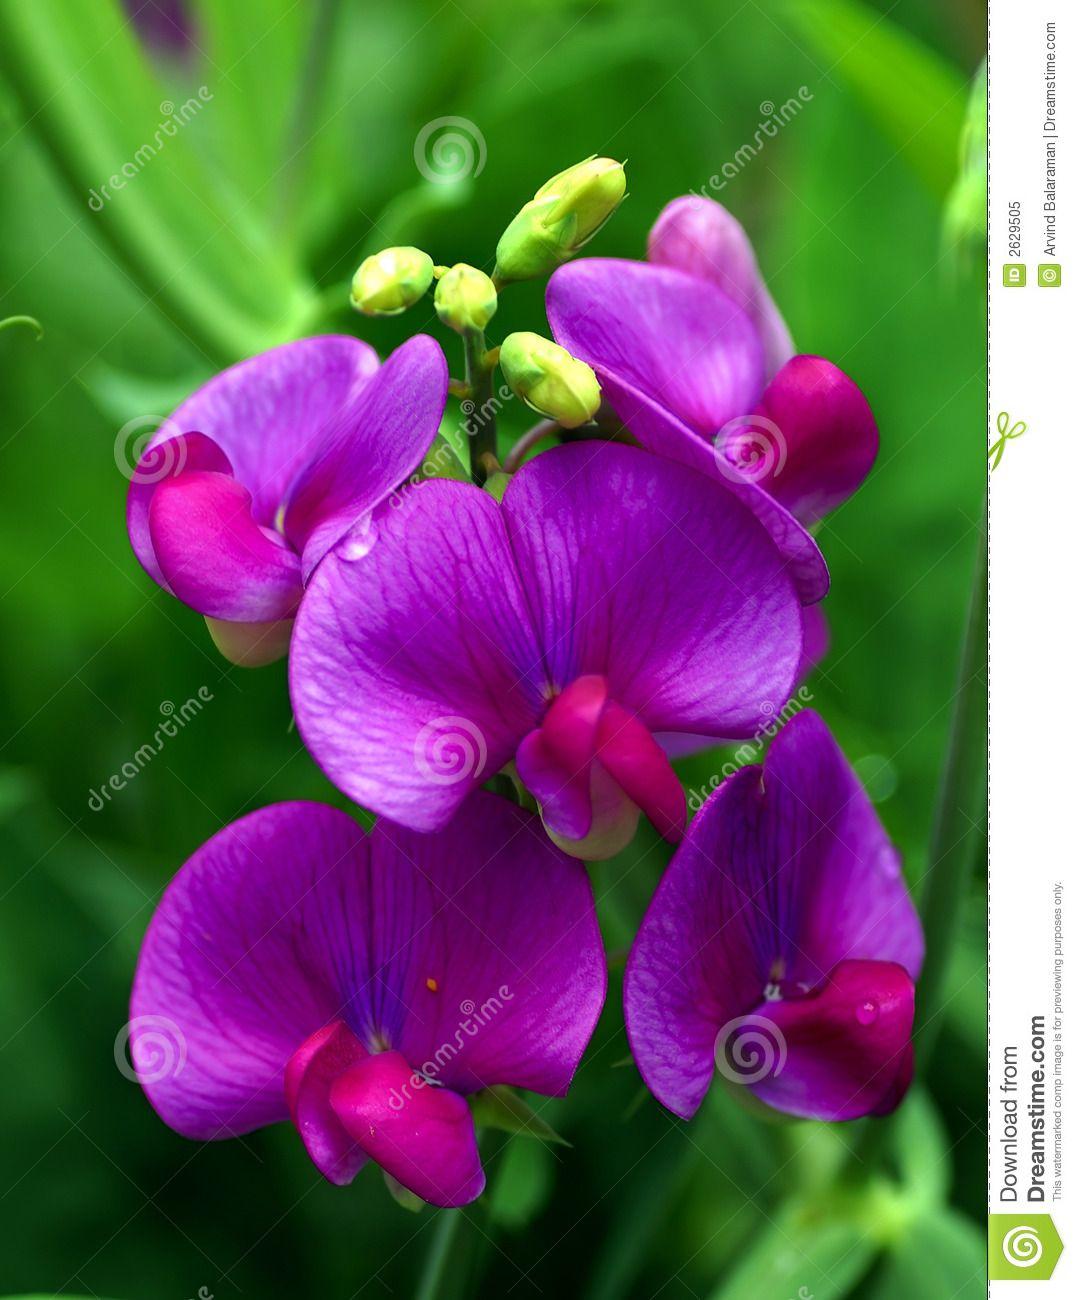 Sweet Pea Royalty Free Stock Image Flowers Pinterest